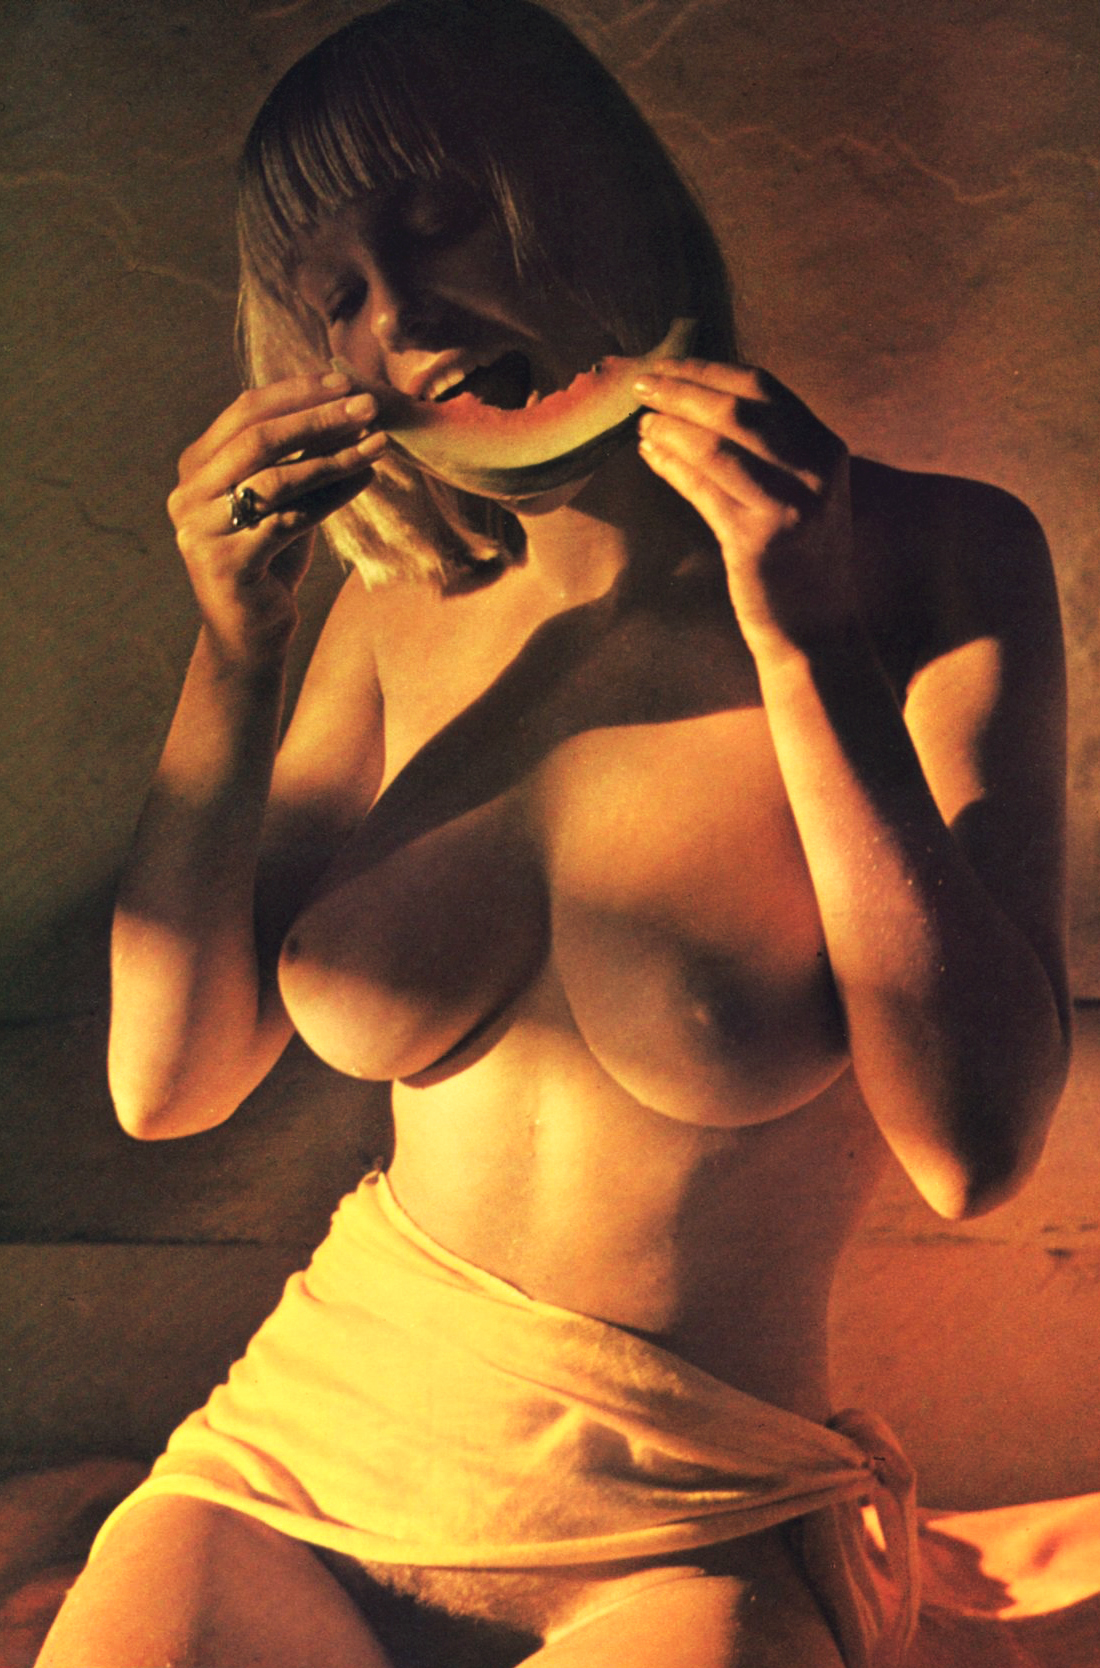 Maria-Eldridge-Penthouse-Magazine-1974